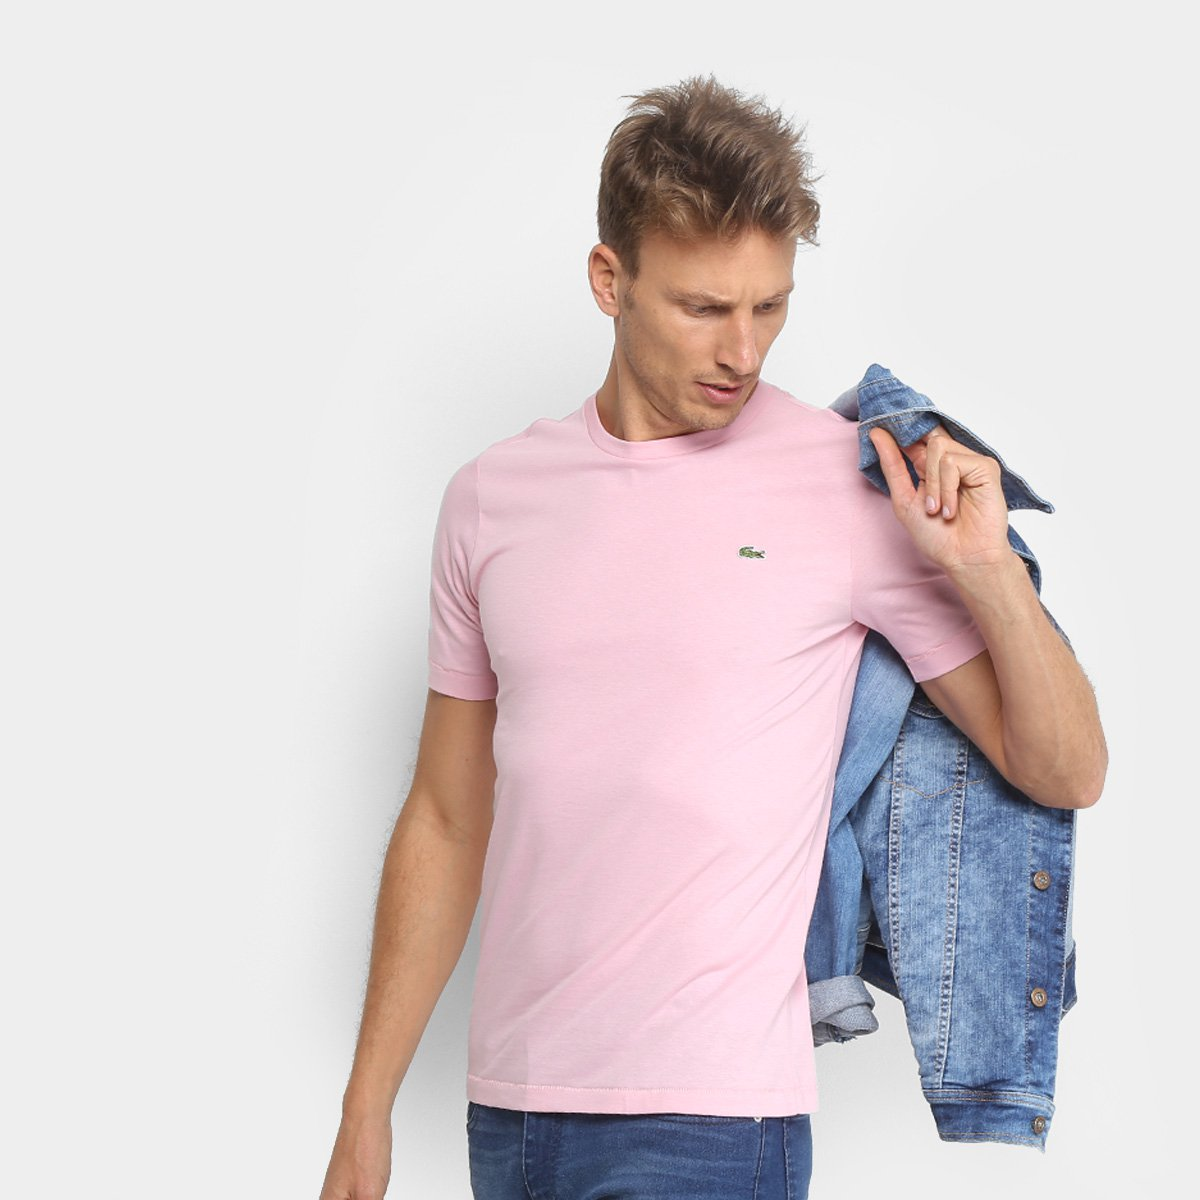 2568f245cc88e Camiseta Lacoste Live Masculina - Compre Agora